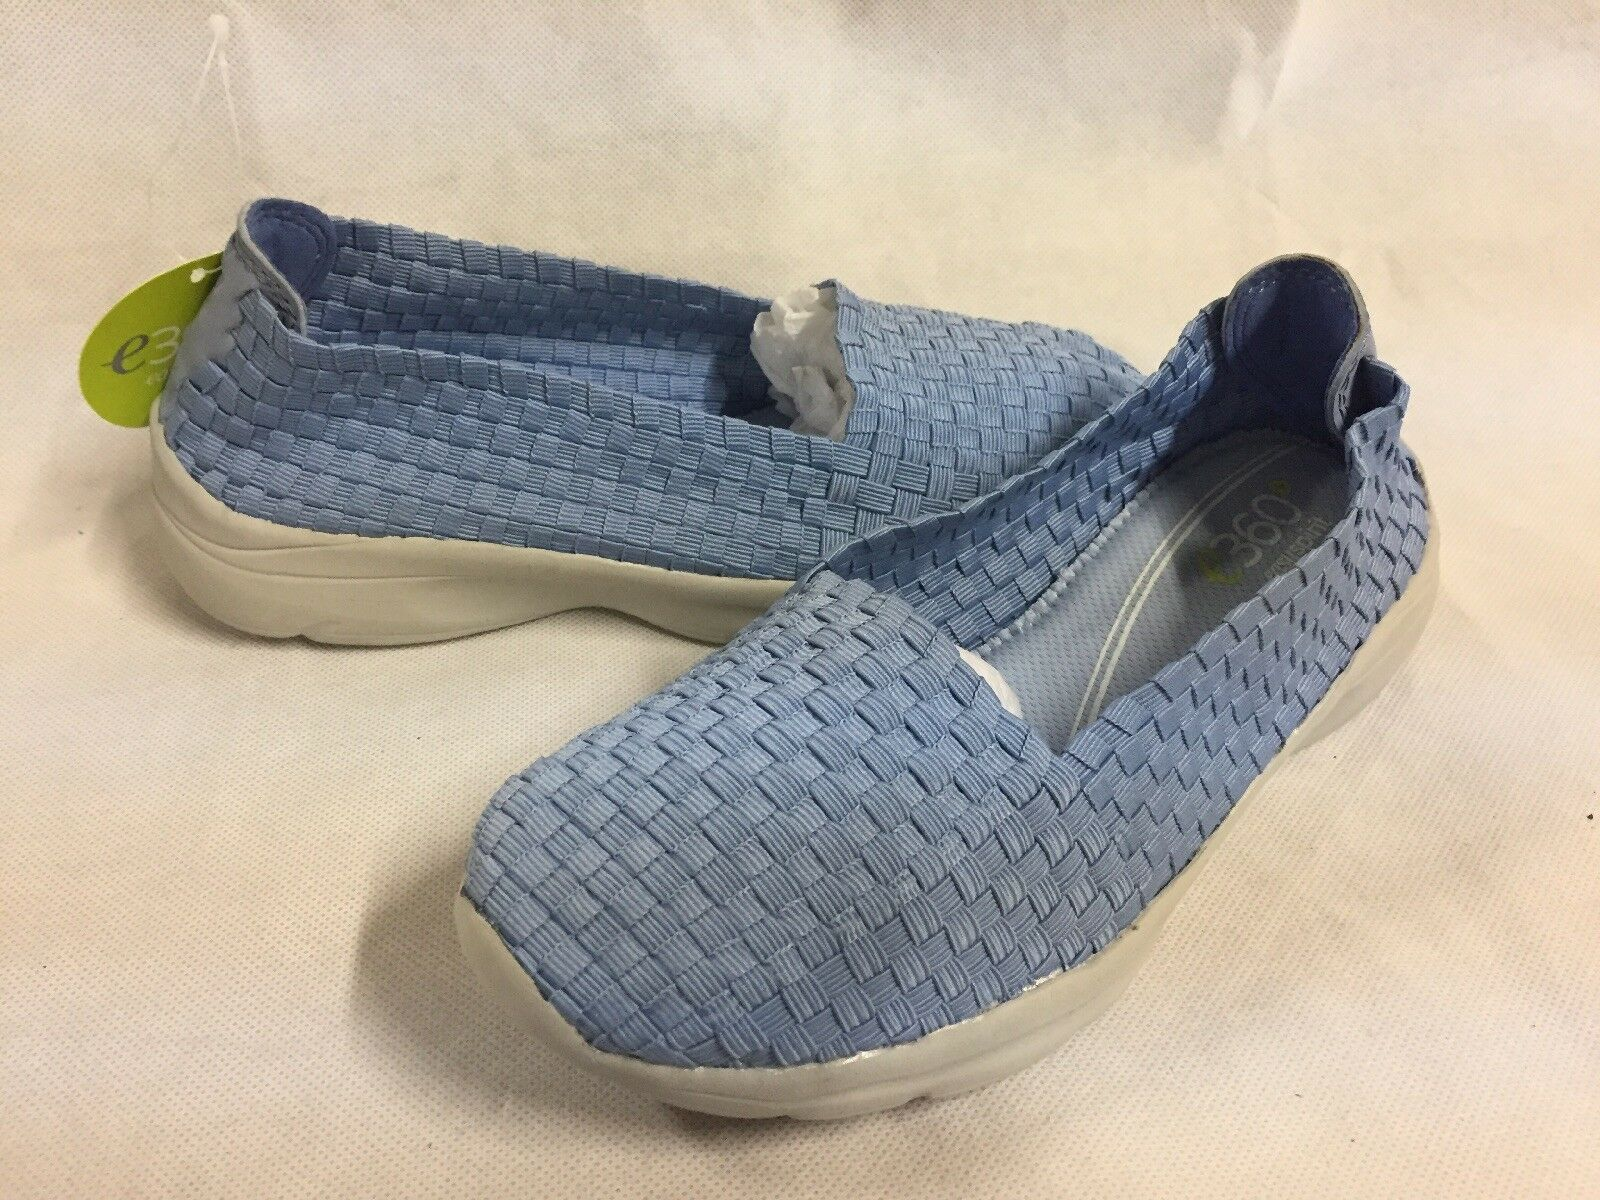 Easy Spirit Women's Confort shoes, bluee, Size 5 Eur 35.5....Flat 1